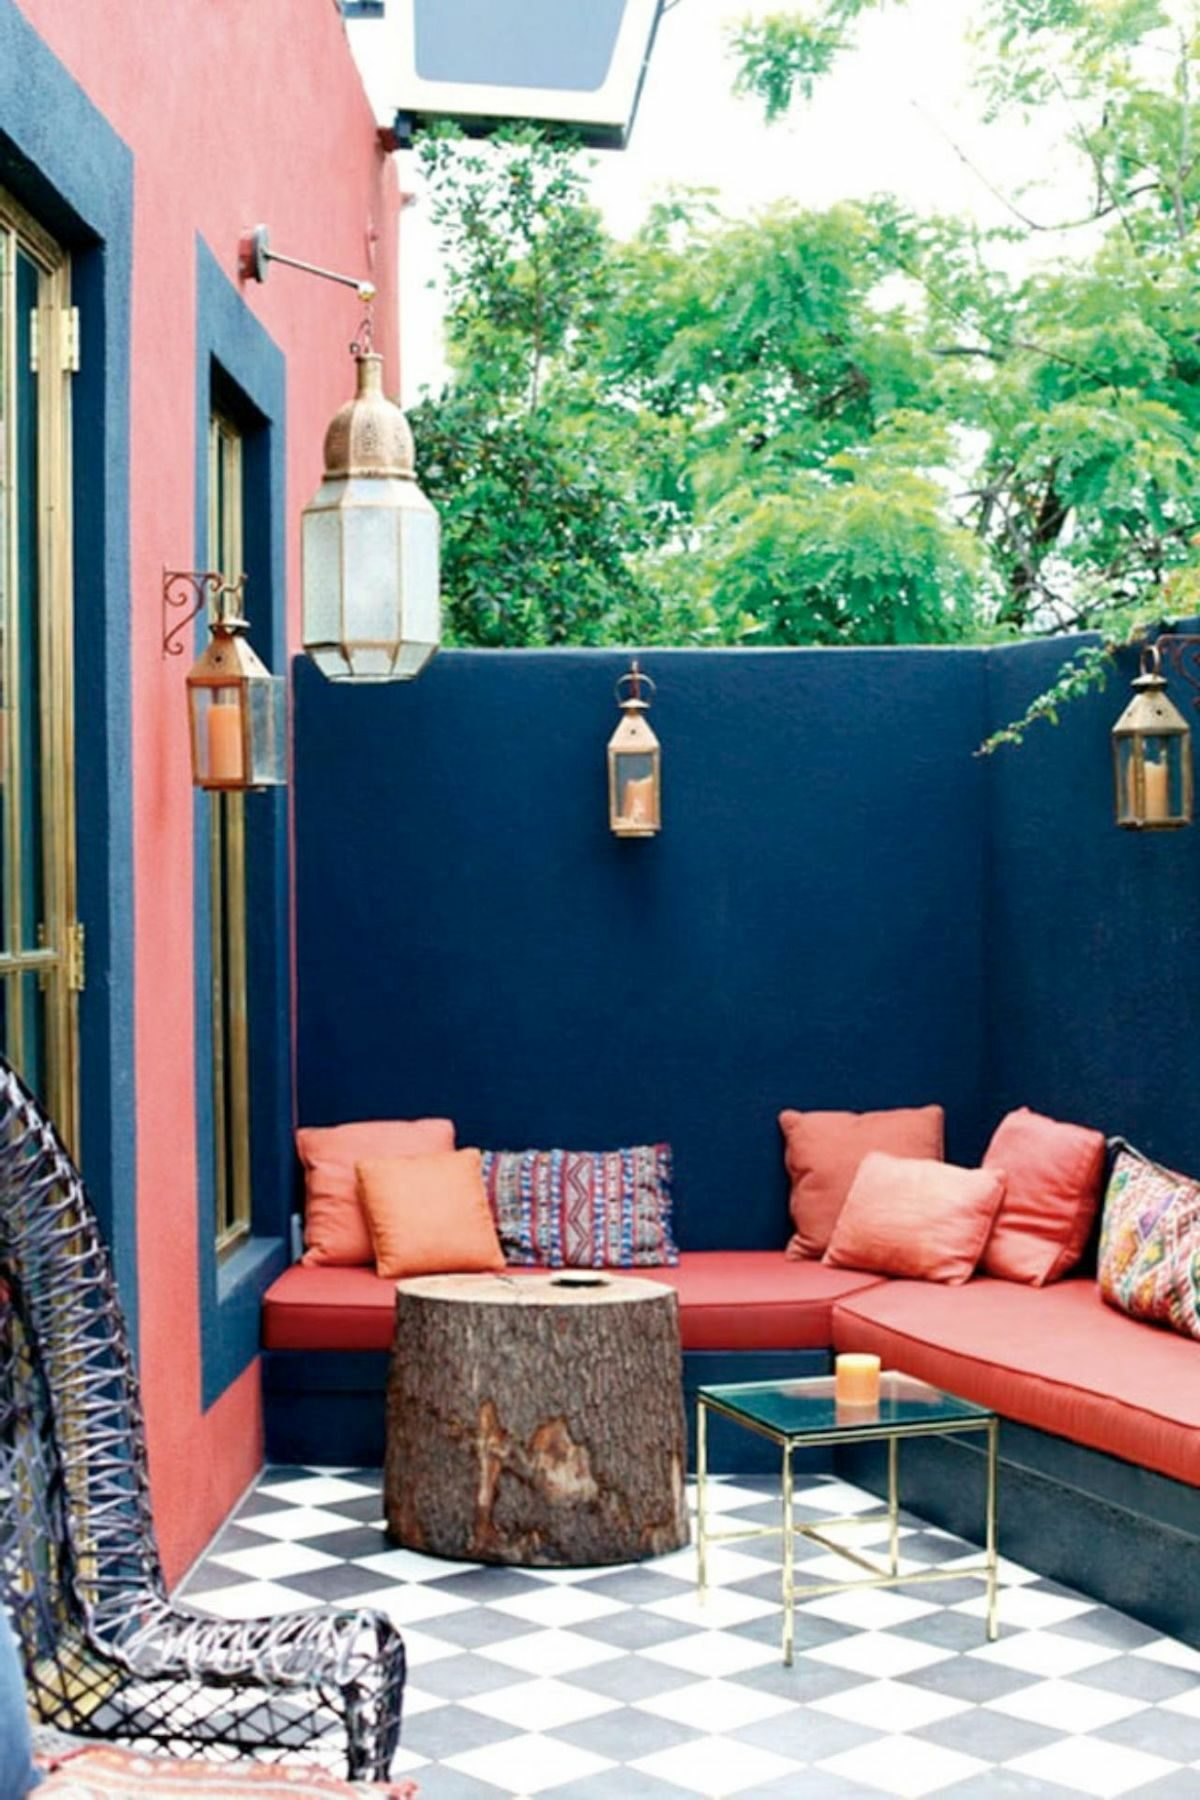 terrasse bleu marine rouge banquette lanterne